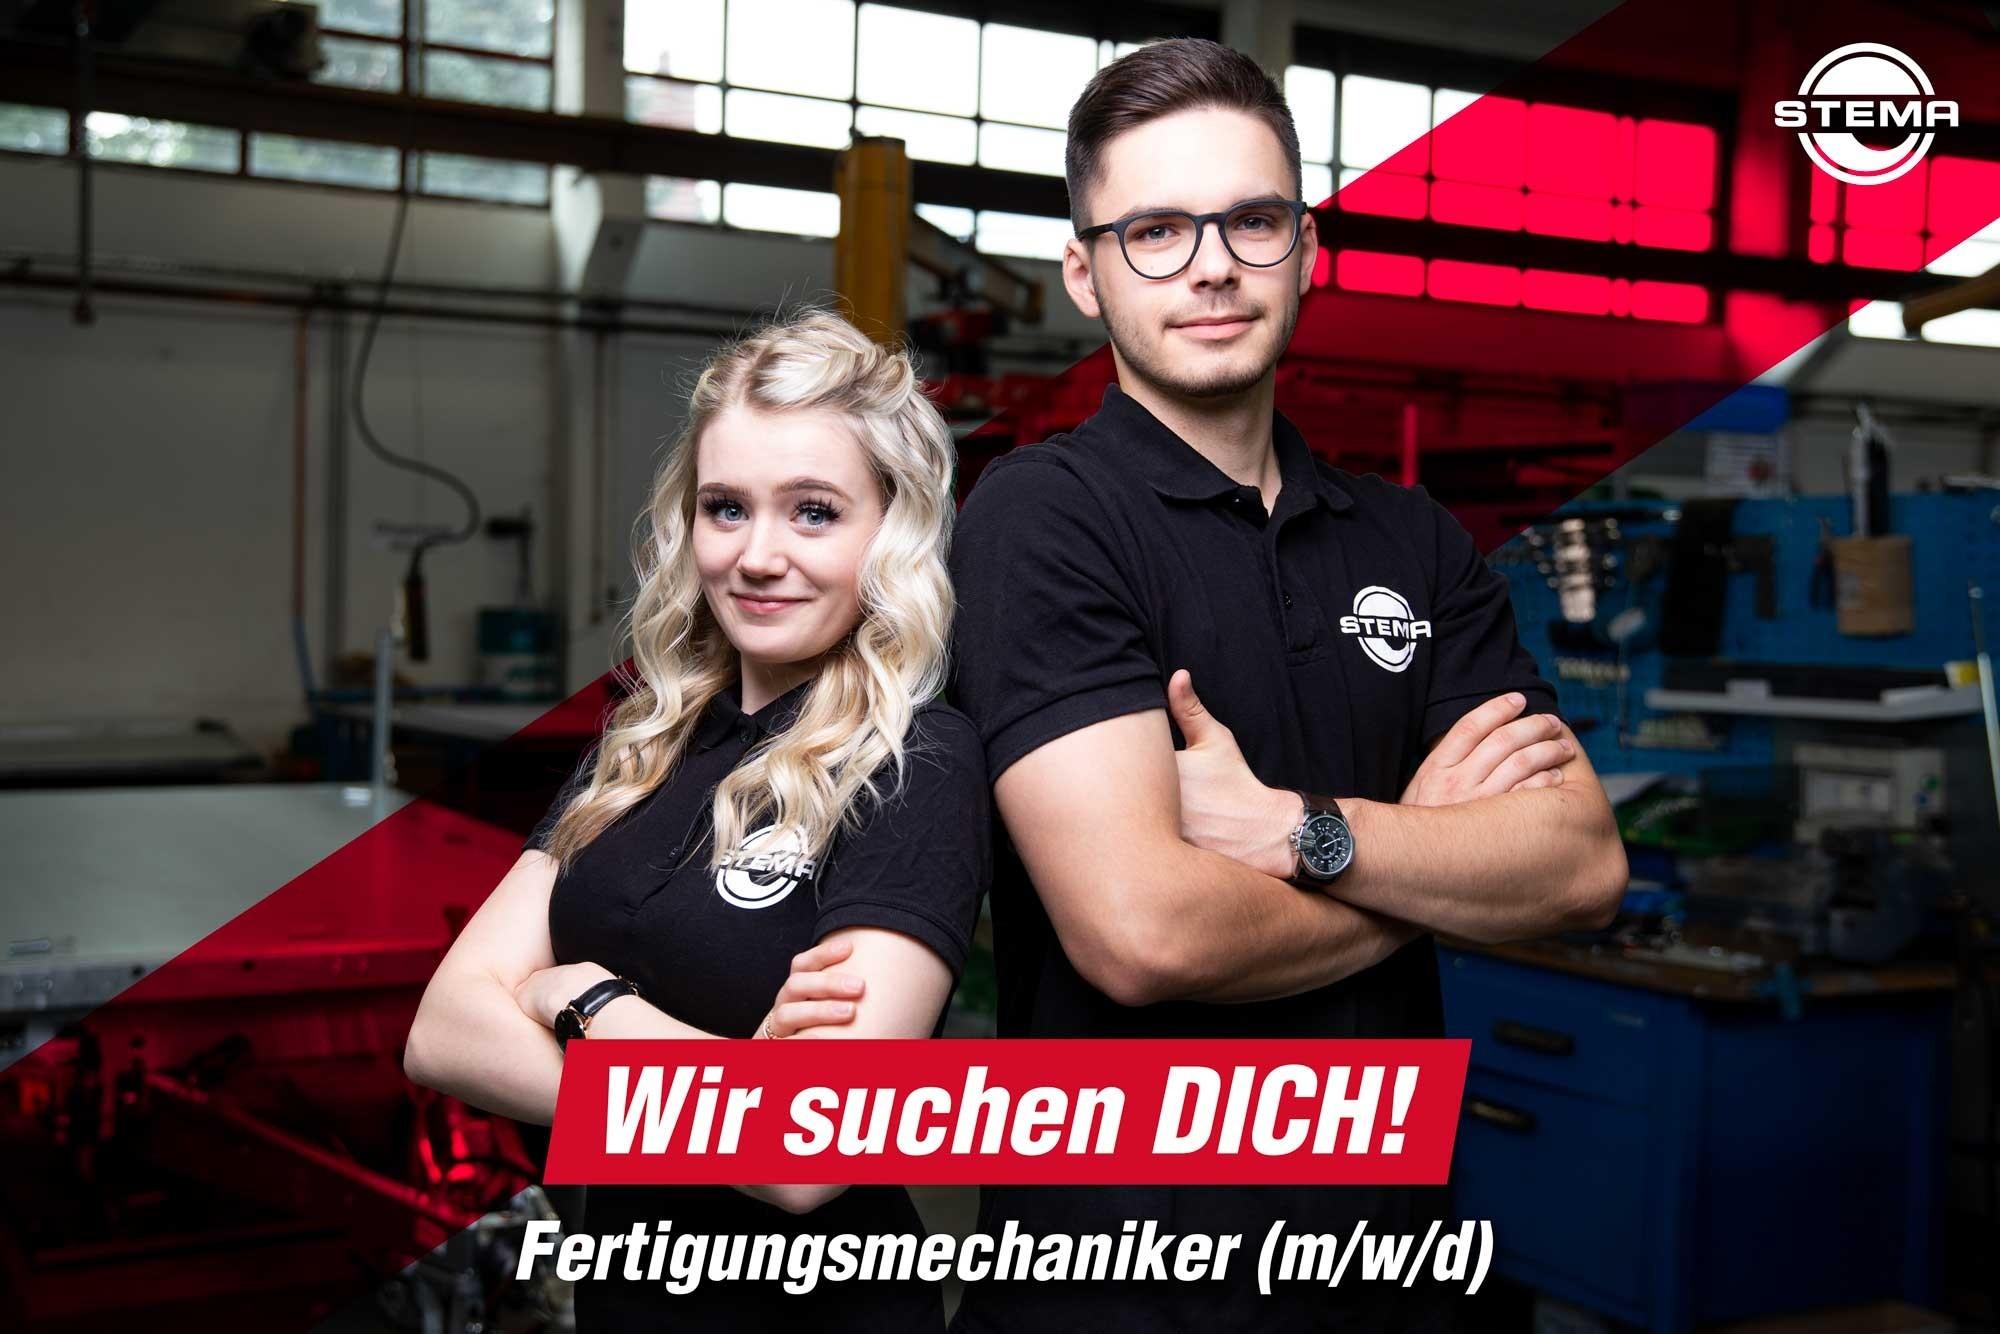 Ausbildung zum Fertigungsmechaniker/in